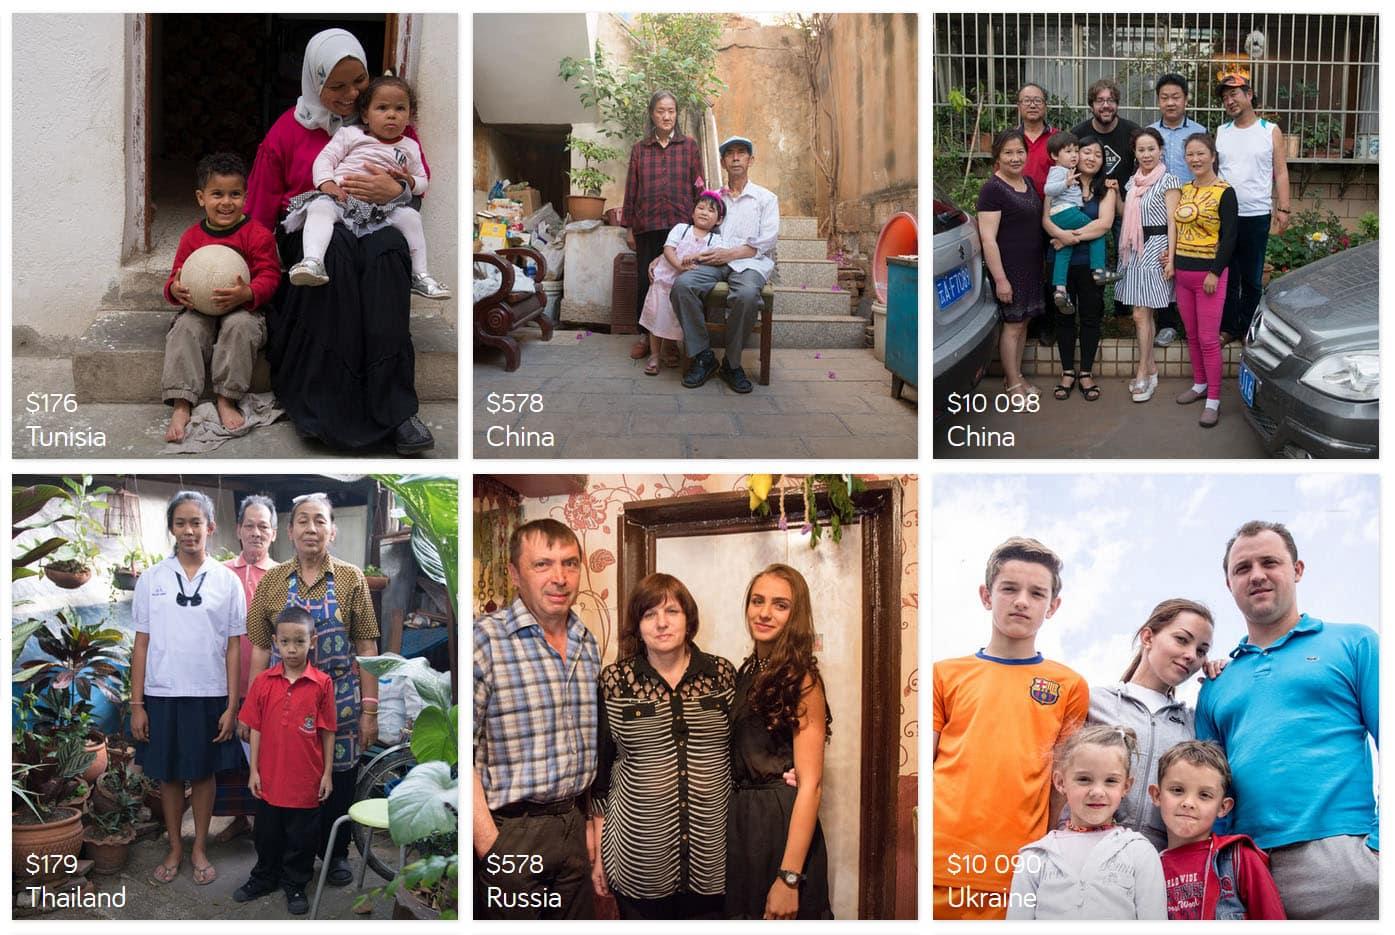 dollar street families